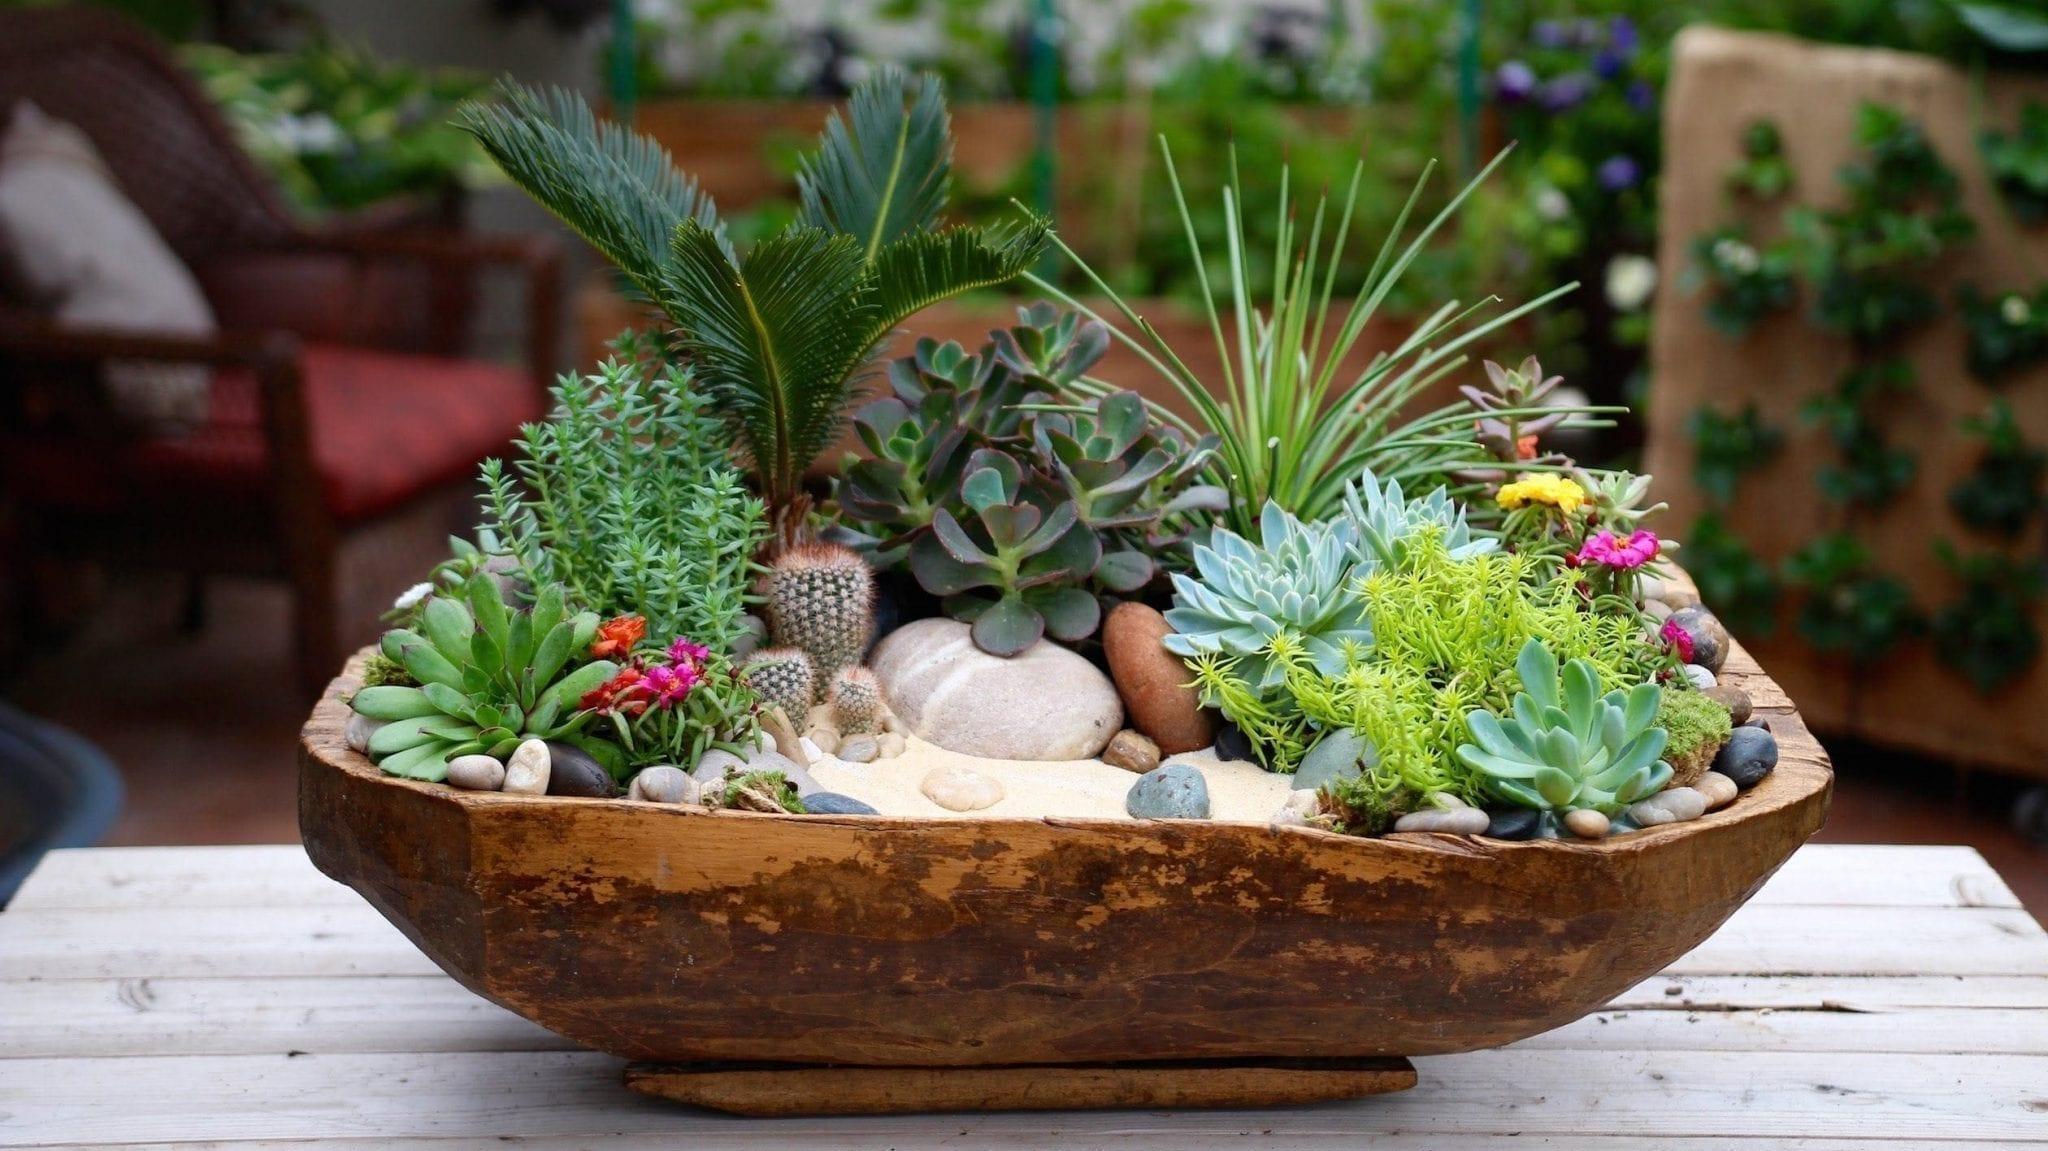 Get Your Succulents & Cactus at Precious Petals Flower Shop in Dublin